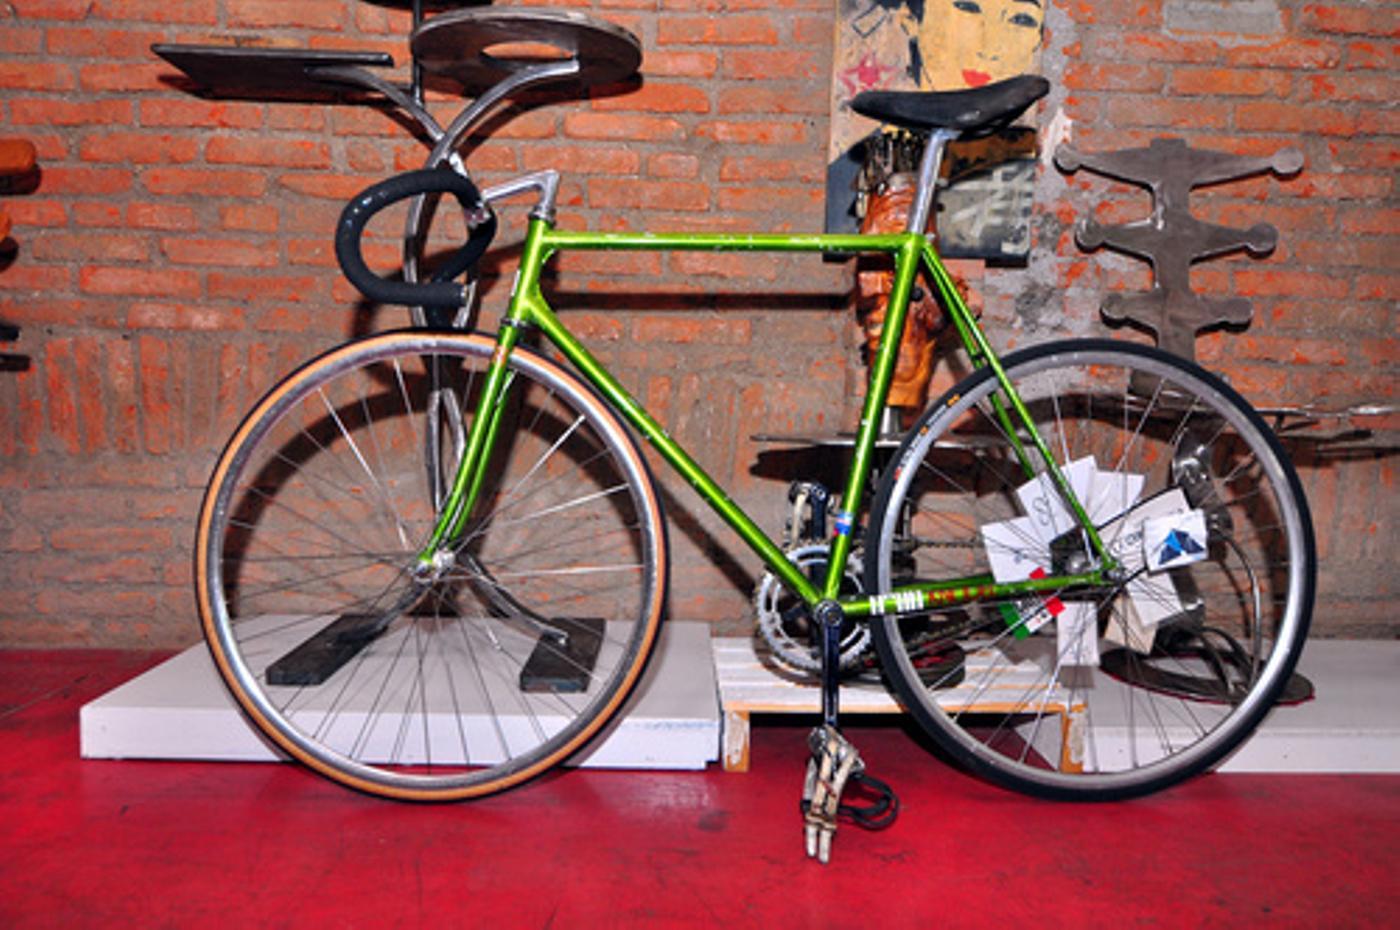 DSC_7624_sorga_bike_with_new_handlebar_1.JPG